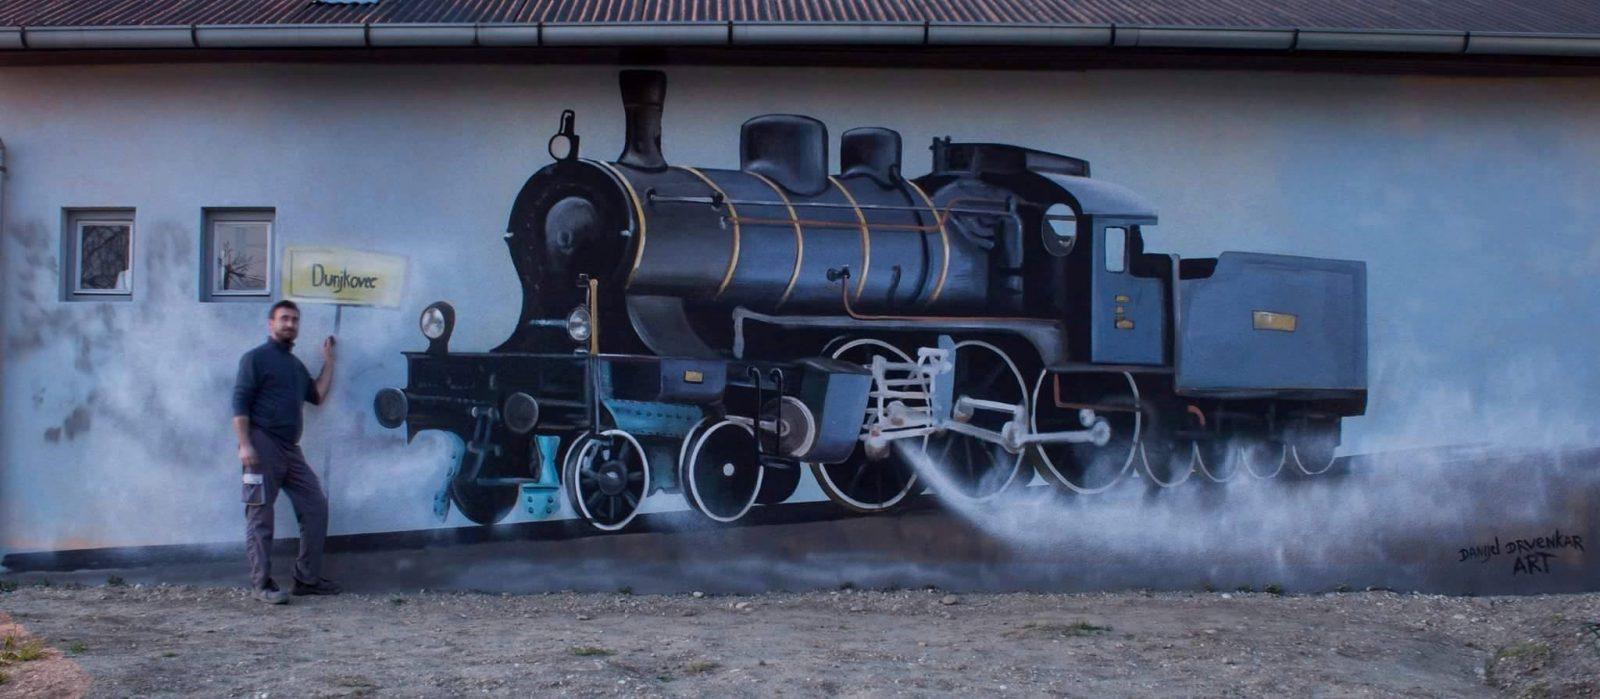 Danijel Drvenkar prva parna lokomotiva Dunjkovec 2